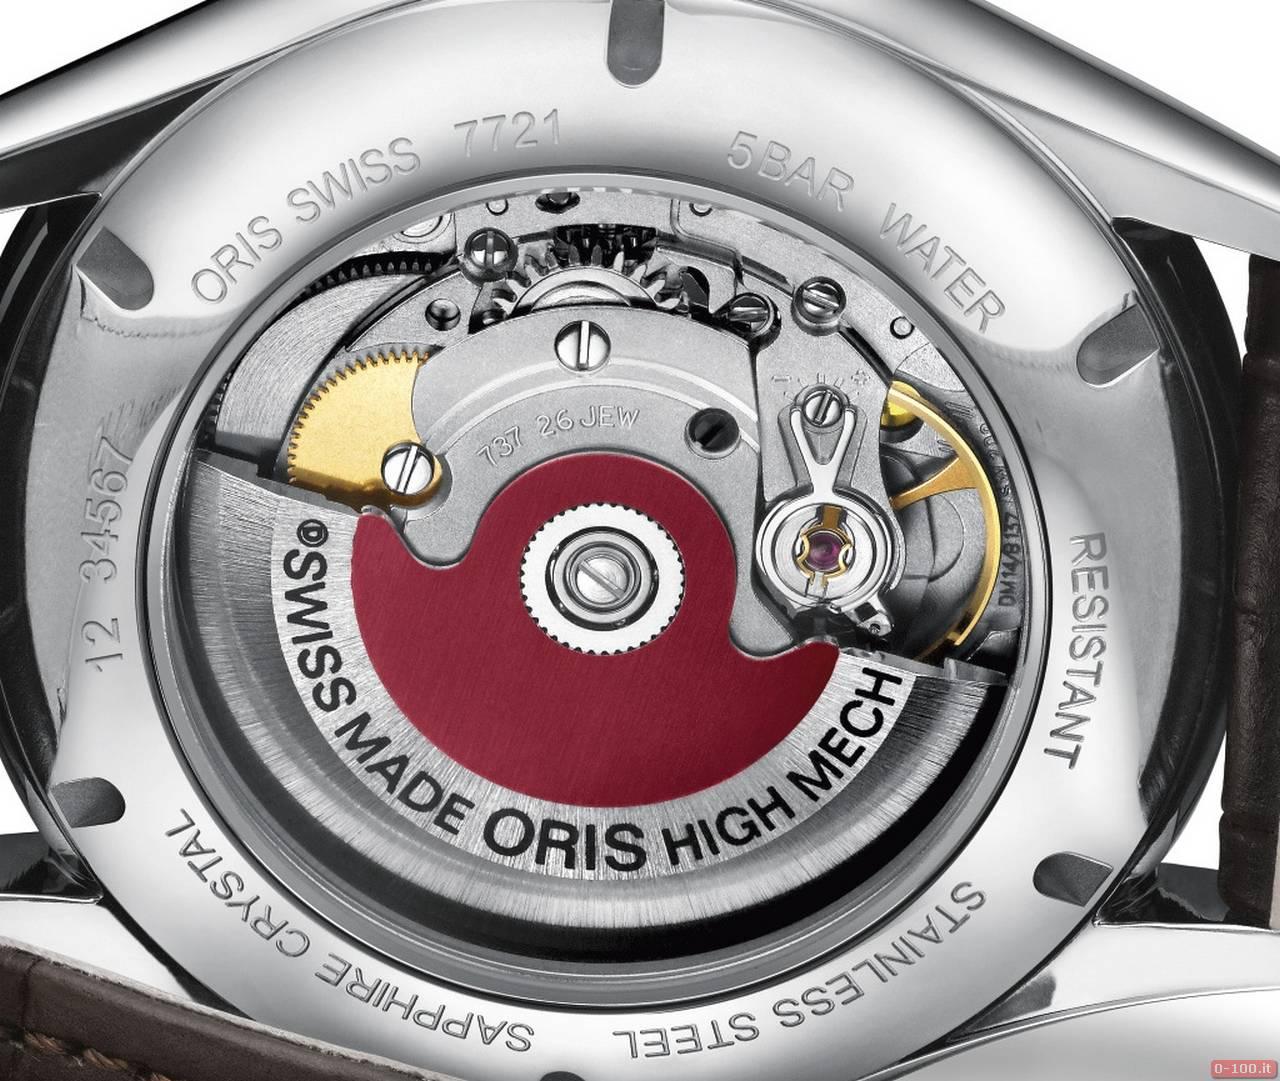 anteprima-baselworld-2016-oris-artelier-chronometer-ref-01-737-7721-4031-ls-prezzo-price_0-1004